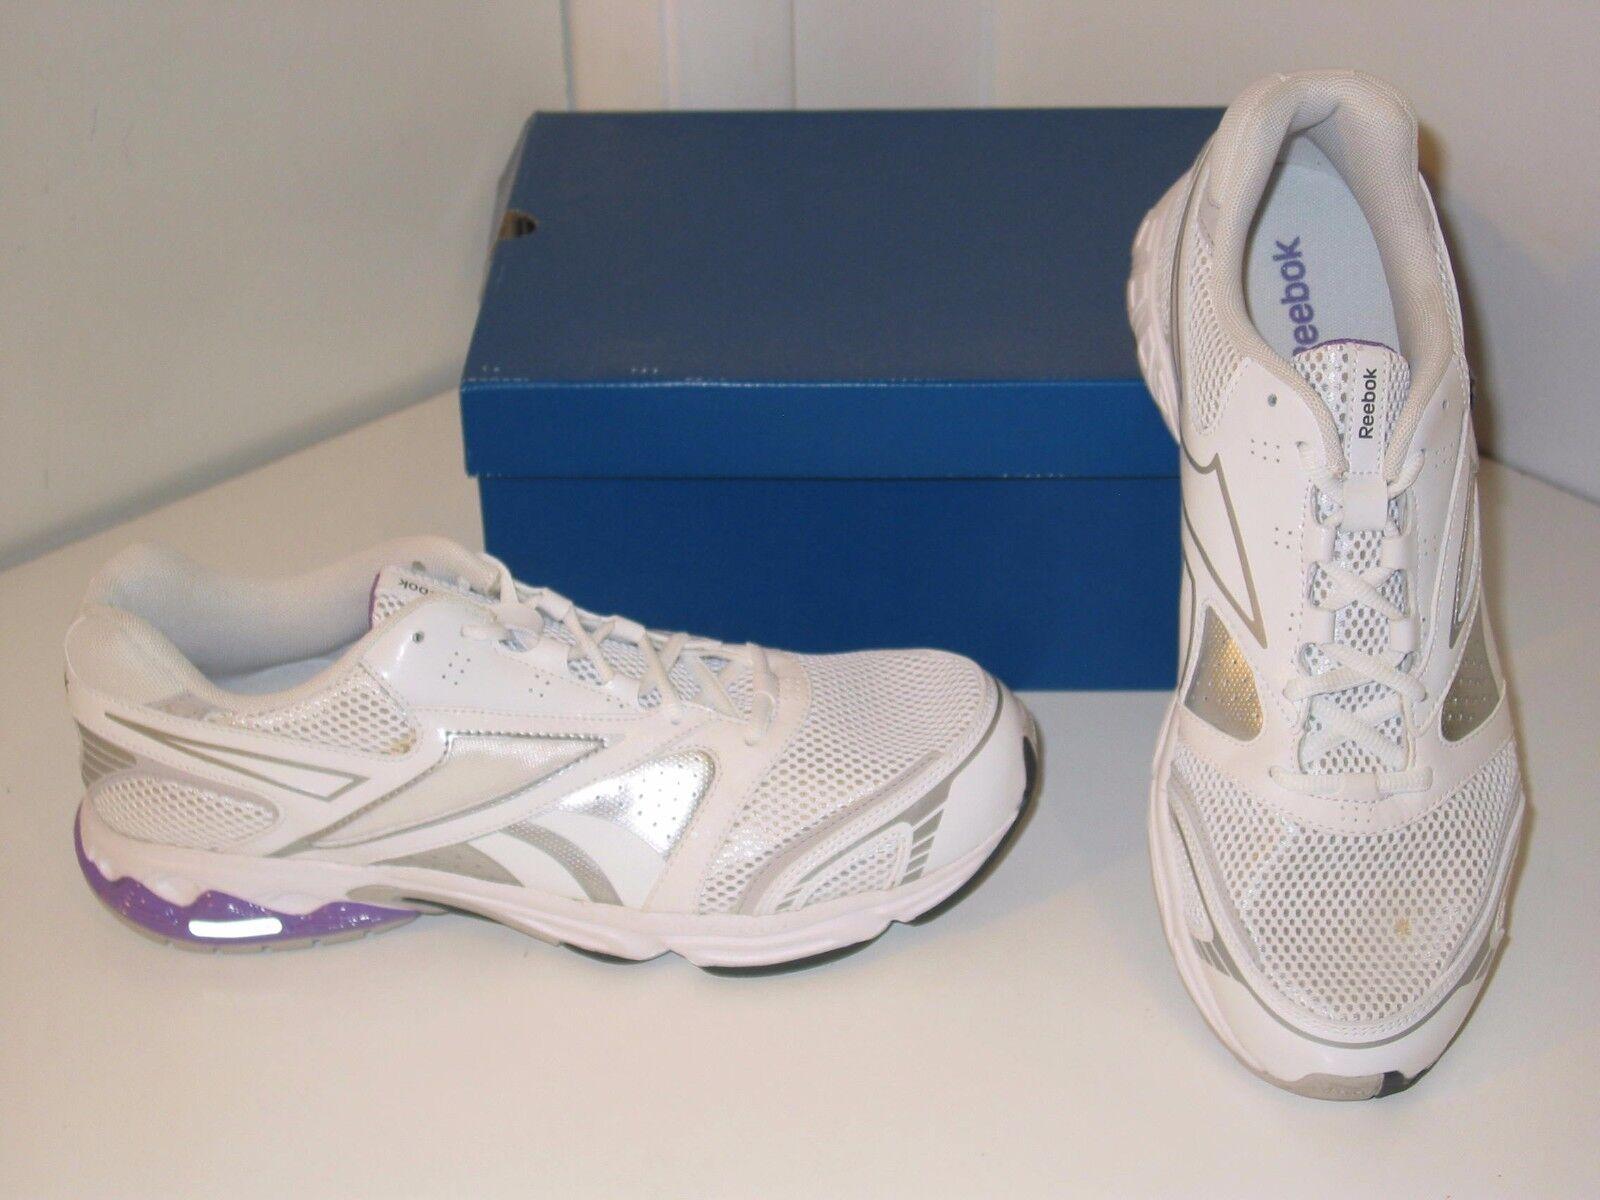 Reebok Instant II Running Cross Training White Mesh Sneakers Shoes Womens 10